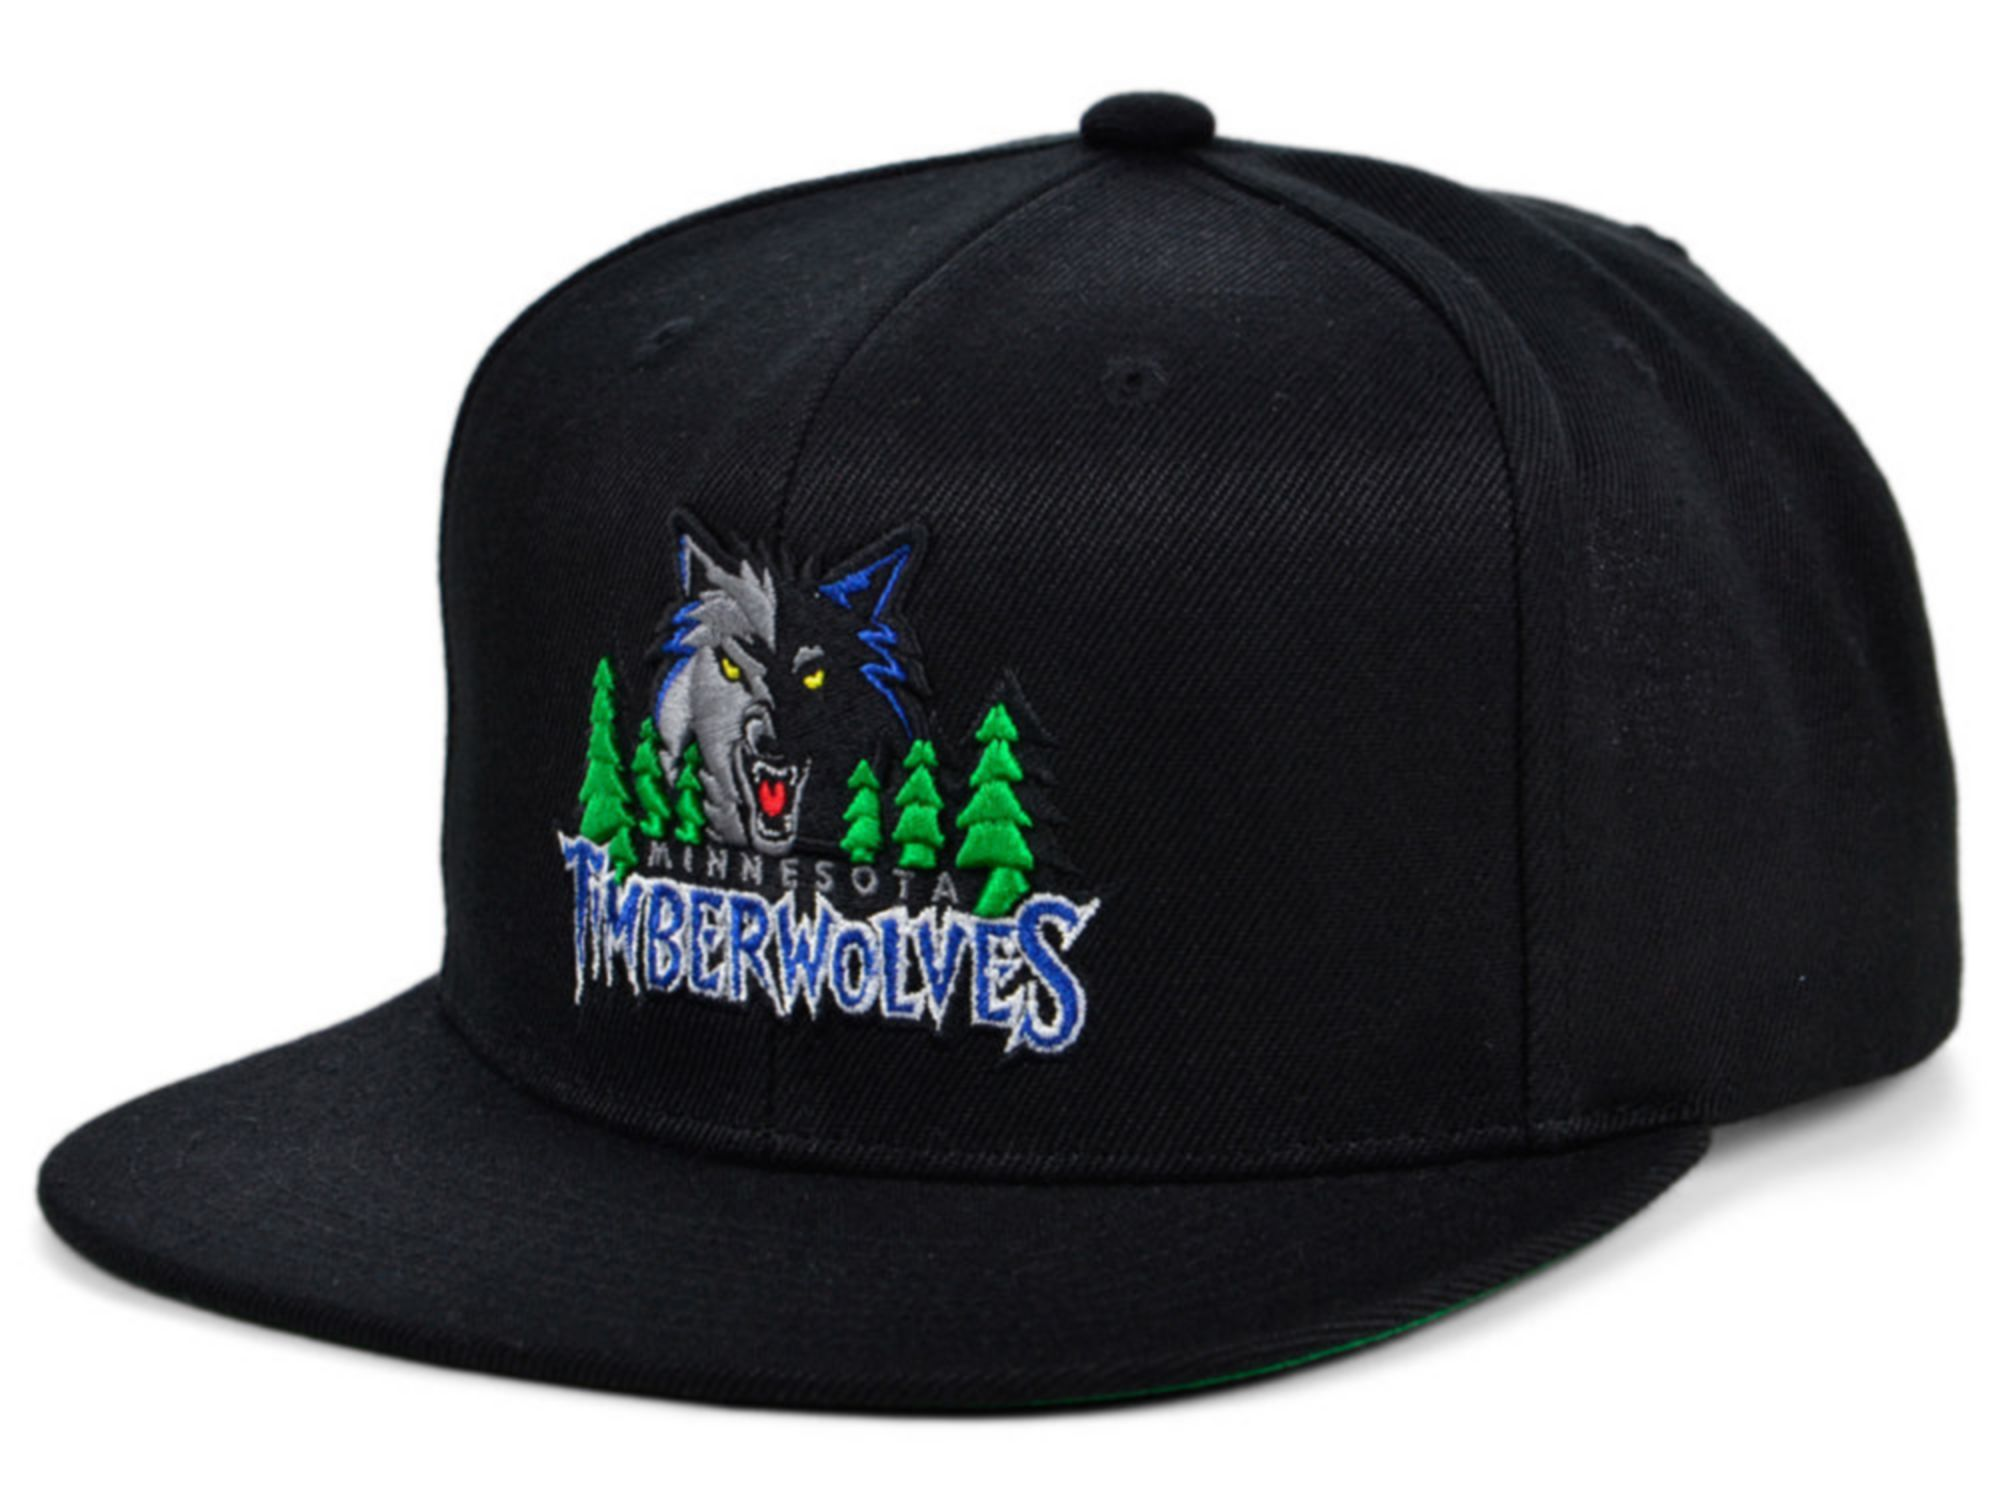 Mitchell & Ness Minnesota Timberwolves HWC Basic Classic Snapback Cap & Reviews - NBA - Sports Fan Shop - Macy's